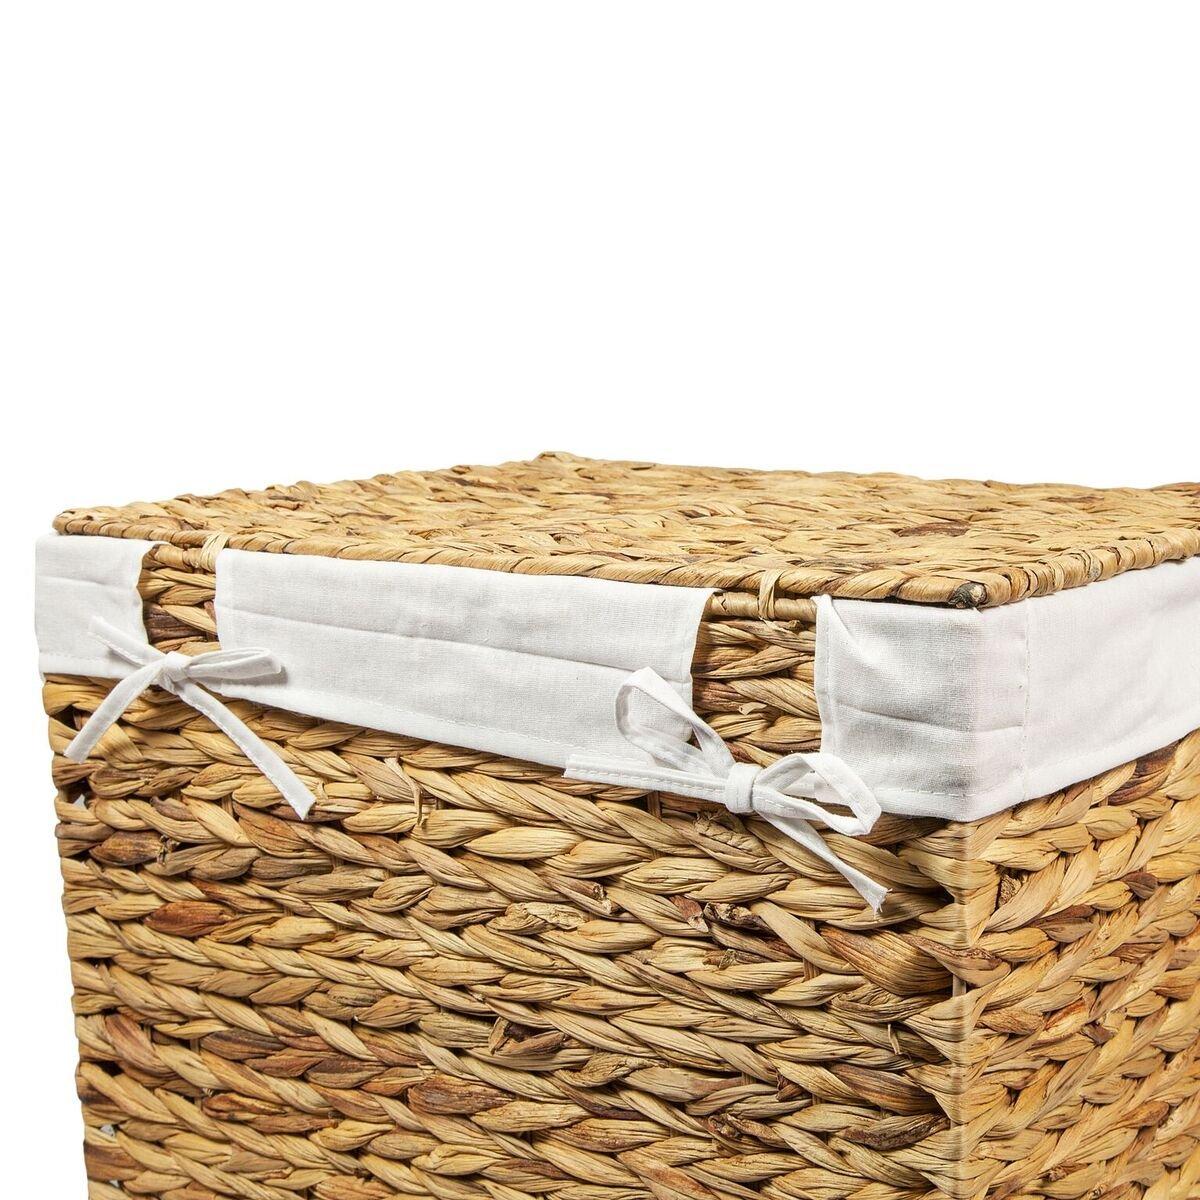 Woodluv Natural Rattan Laundry Storage Basket Linen Bathroom Basket Medium